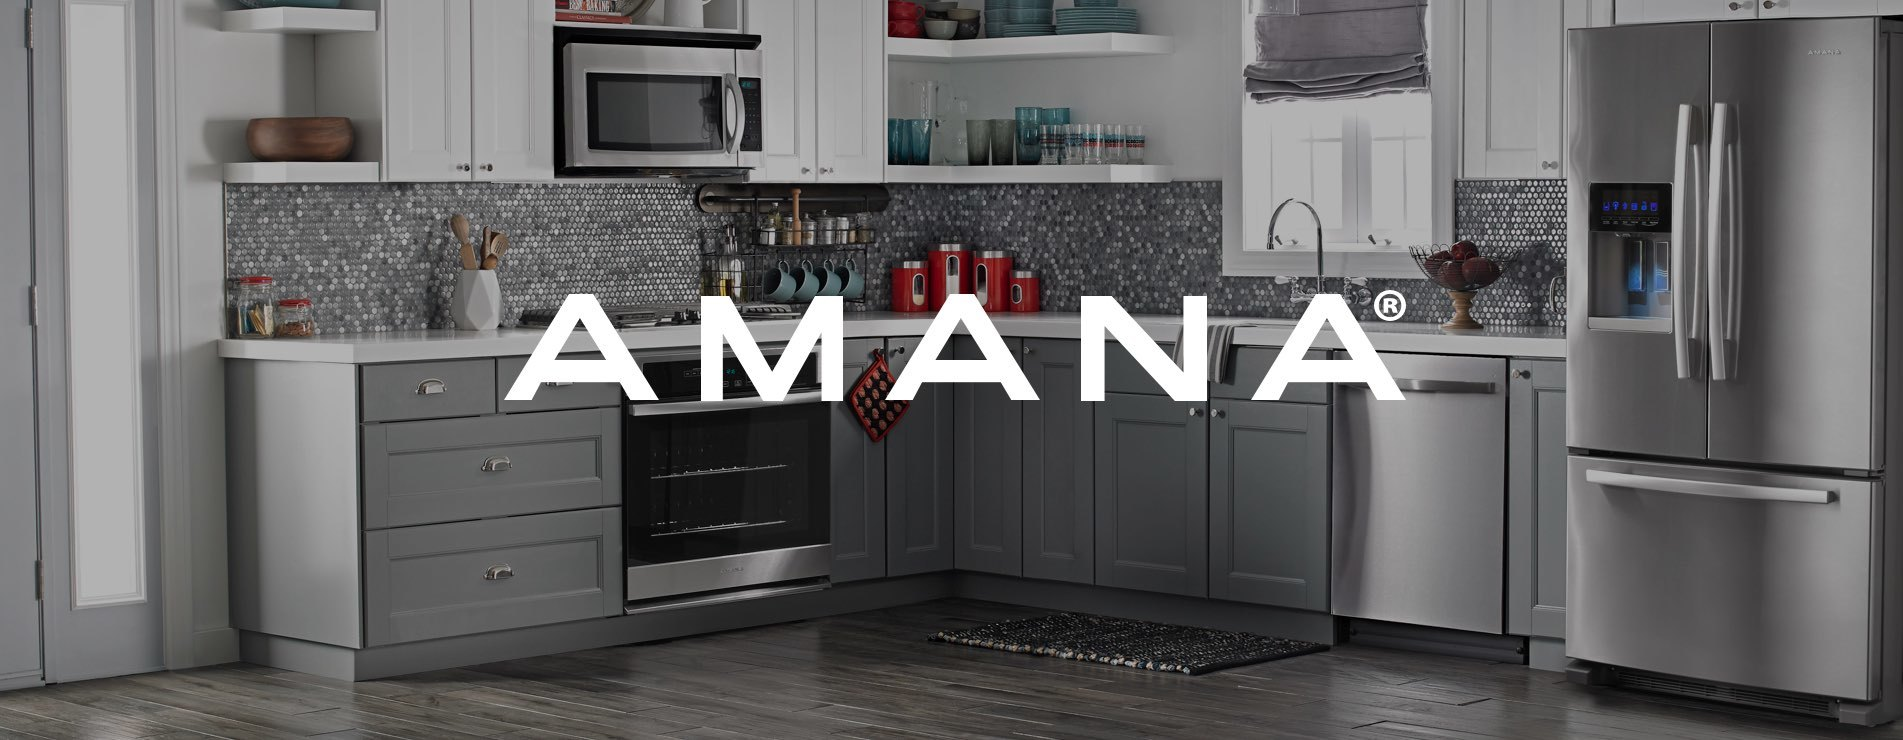 Amana Banner